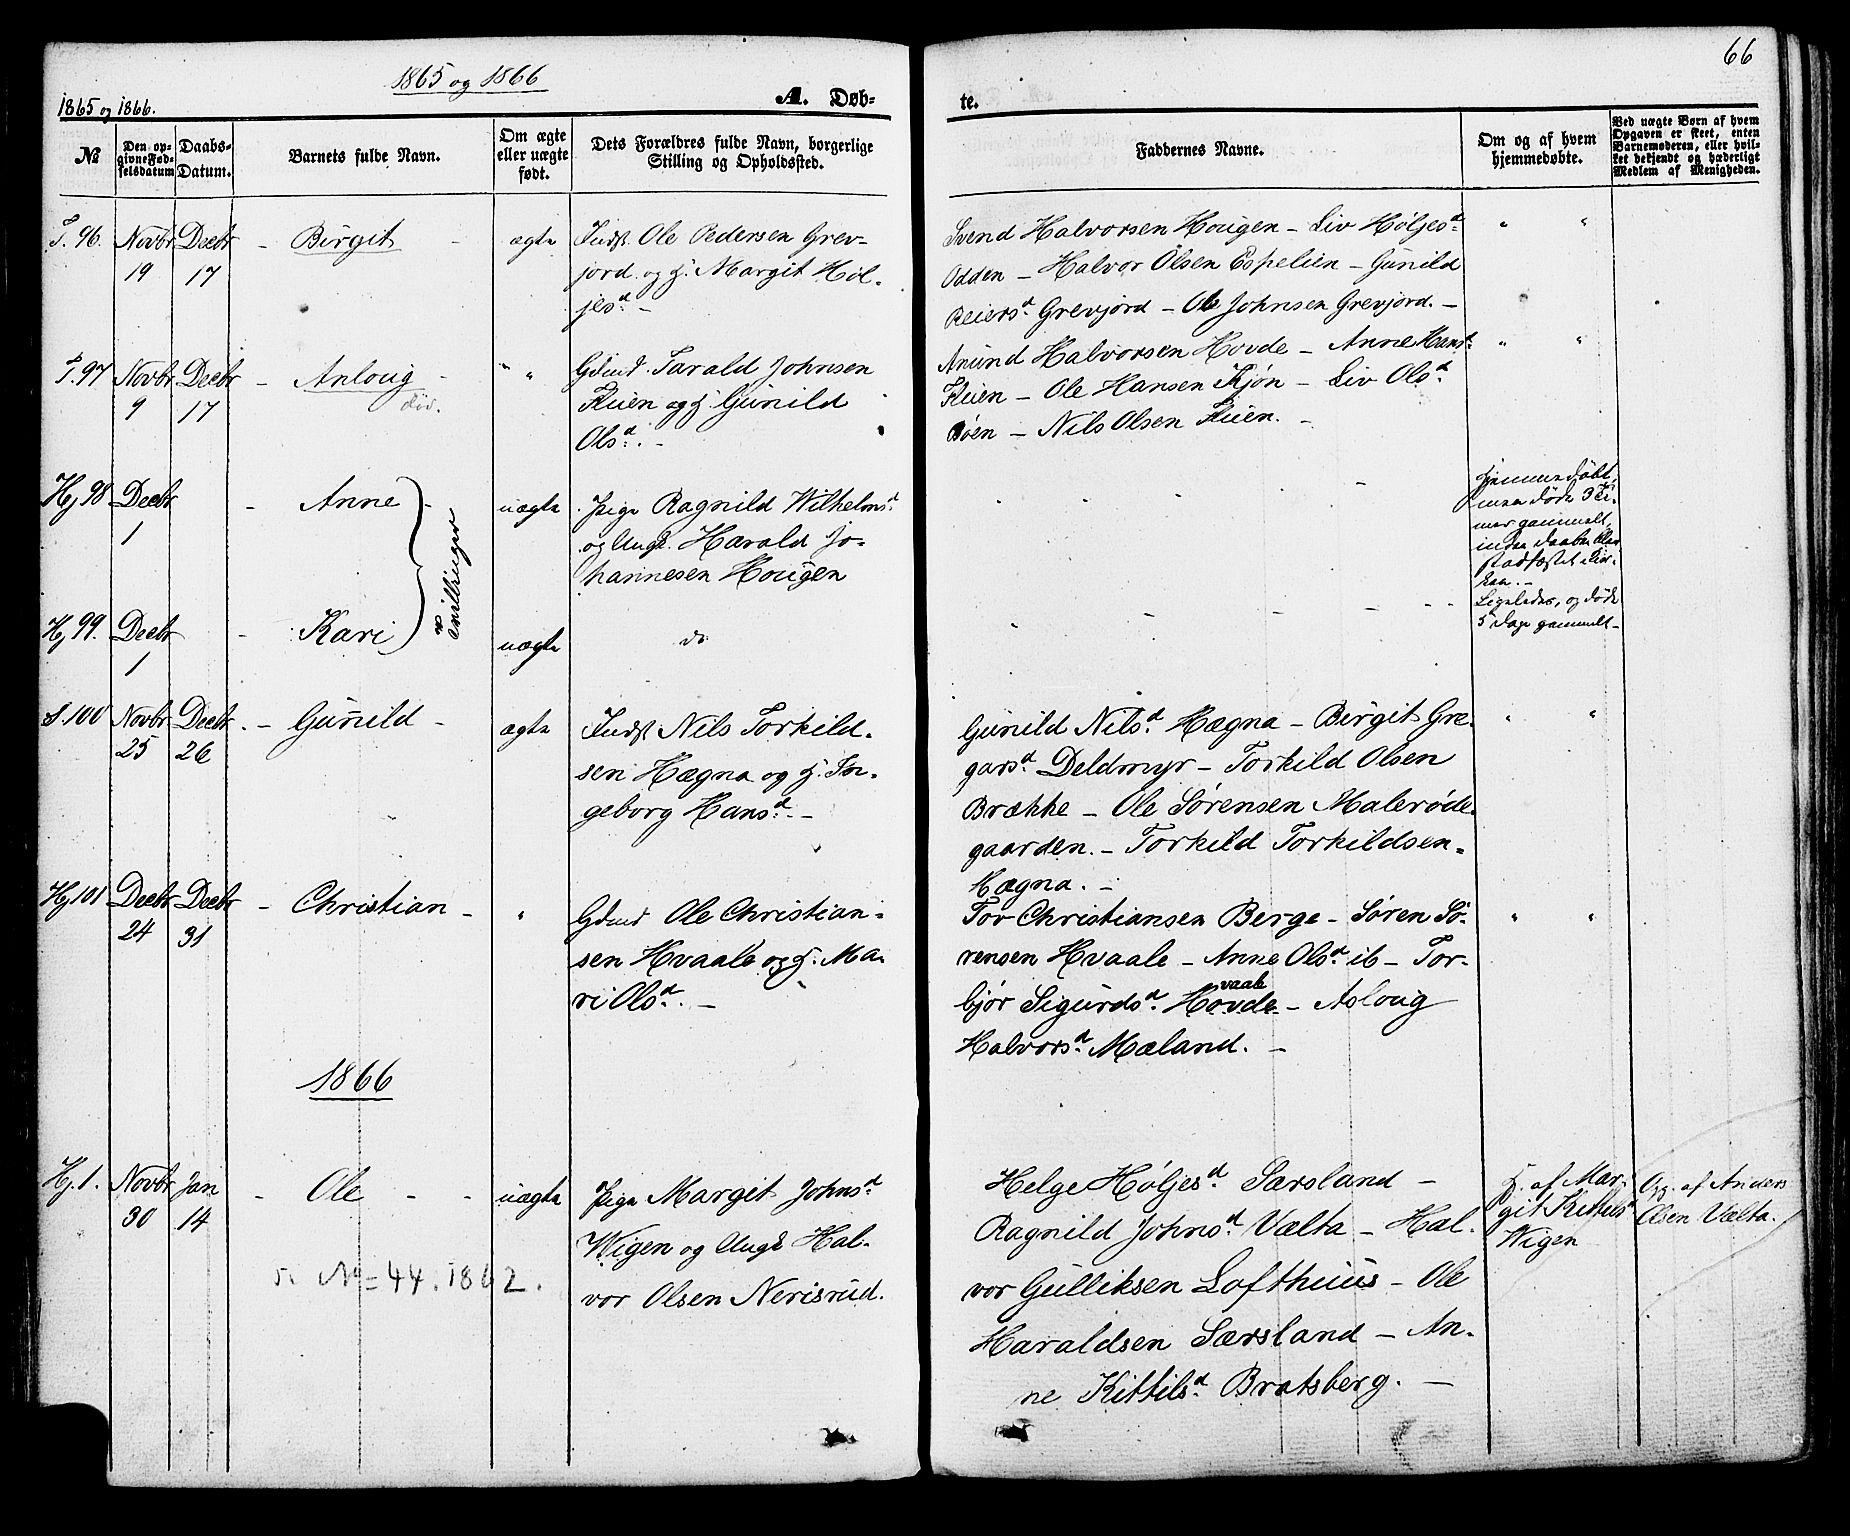 SAKO, Hjartdal kirkebøker, F/Fa/L0009: Ministerialbok nr. I 9, 1860-1879, s. 66